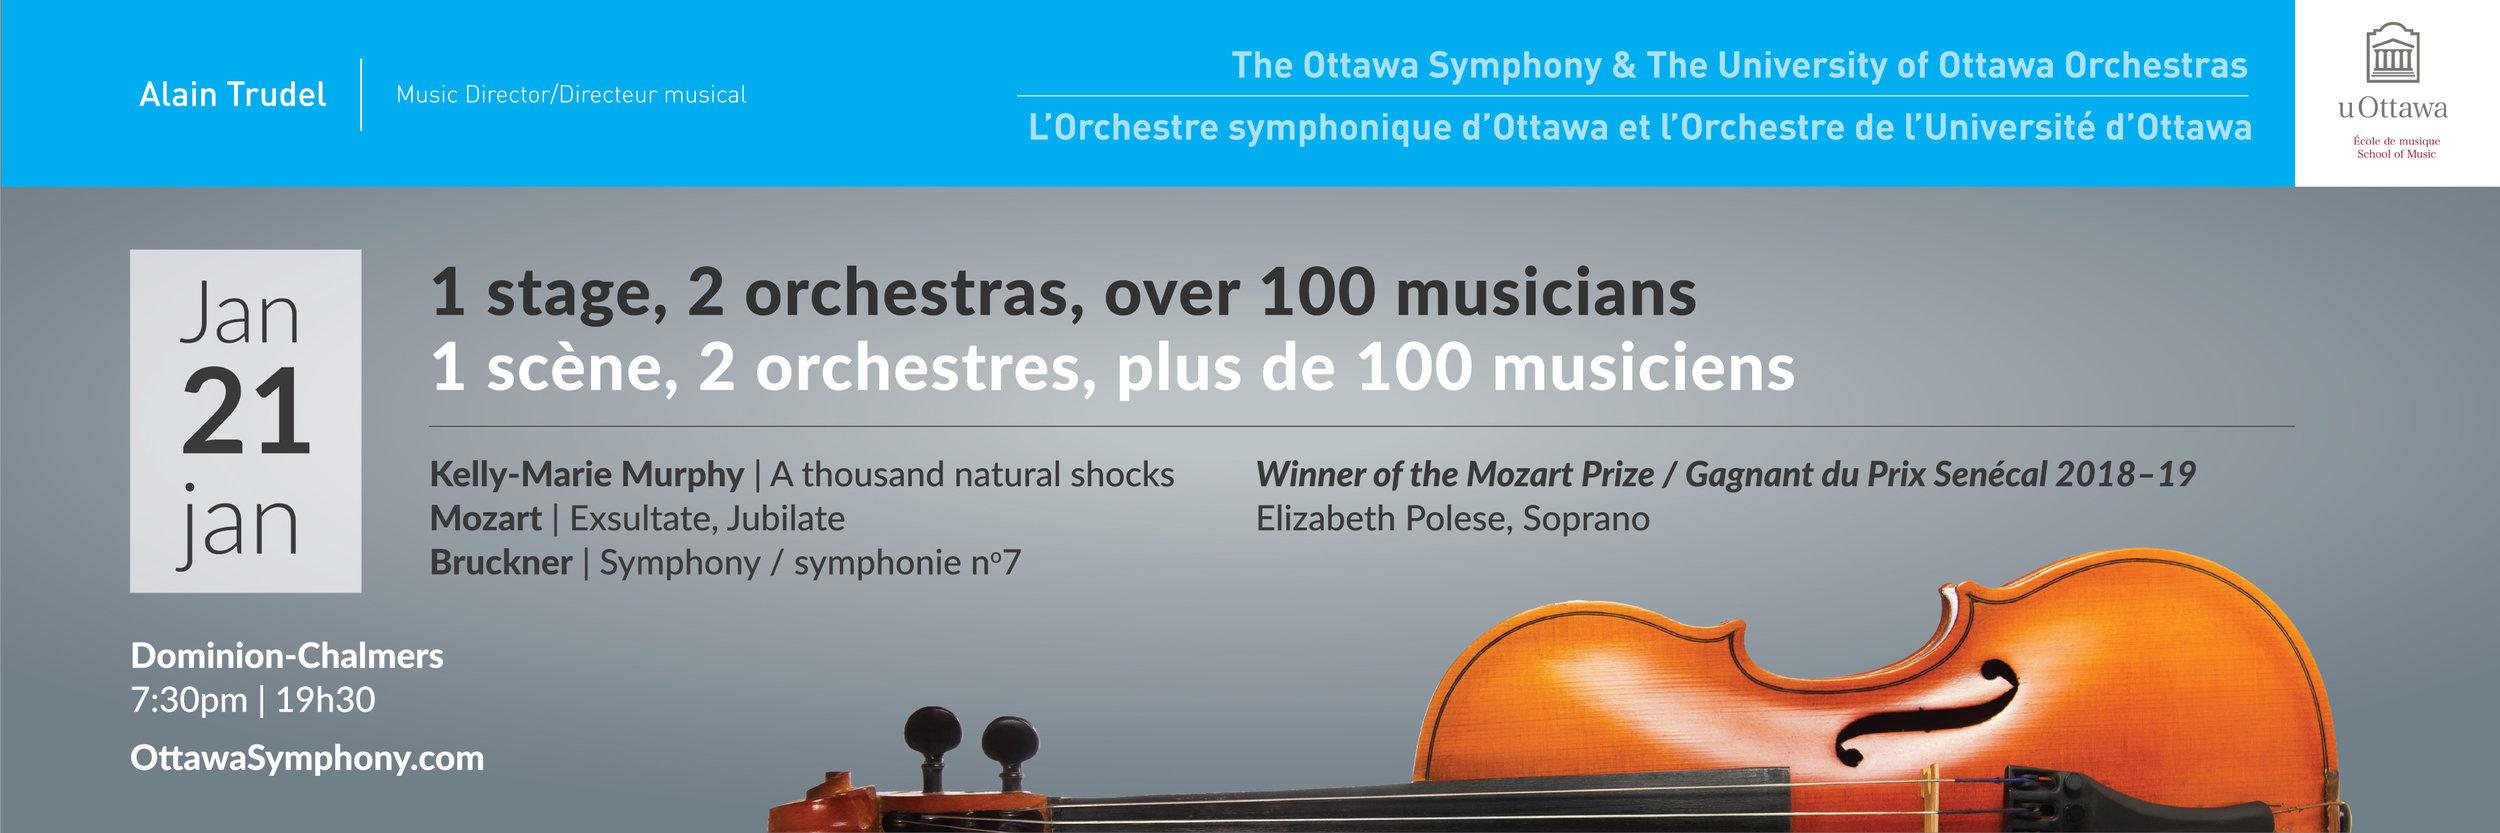 OSO-WEB-Banner-Jan 21 concert .jpg